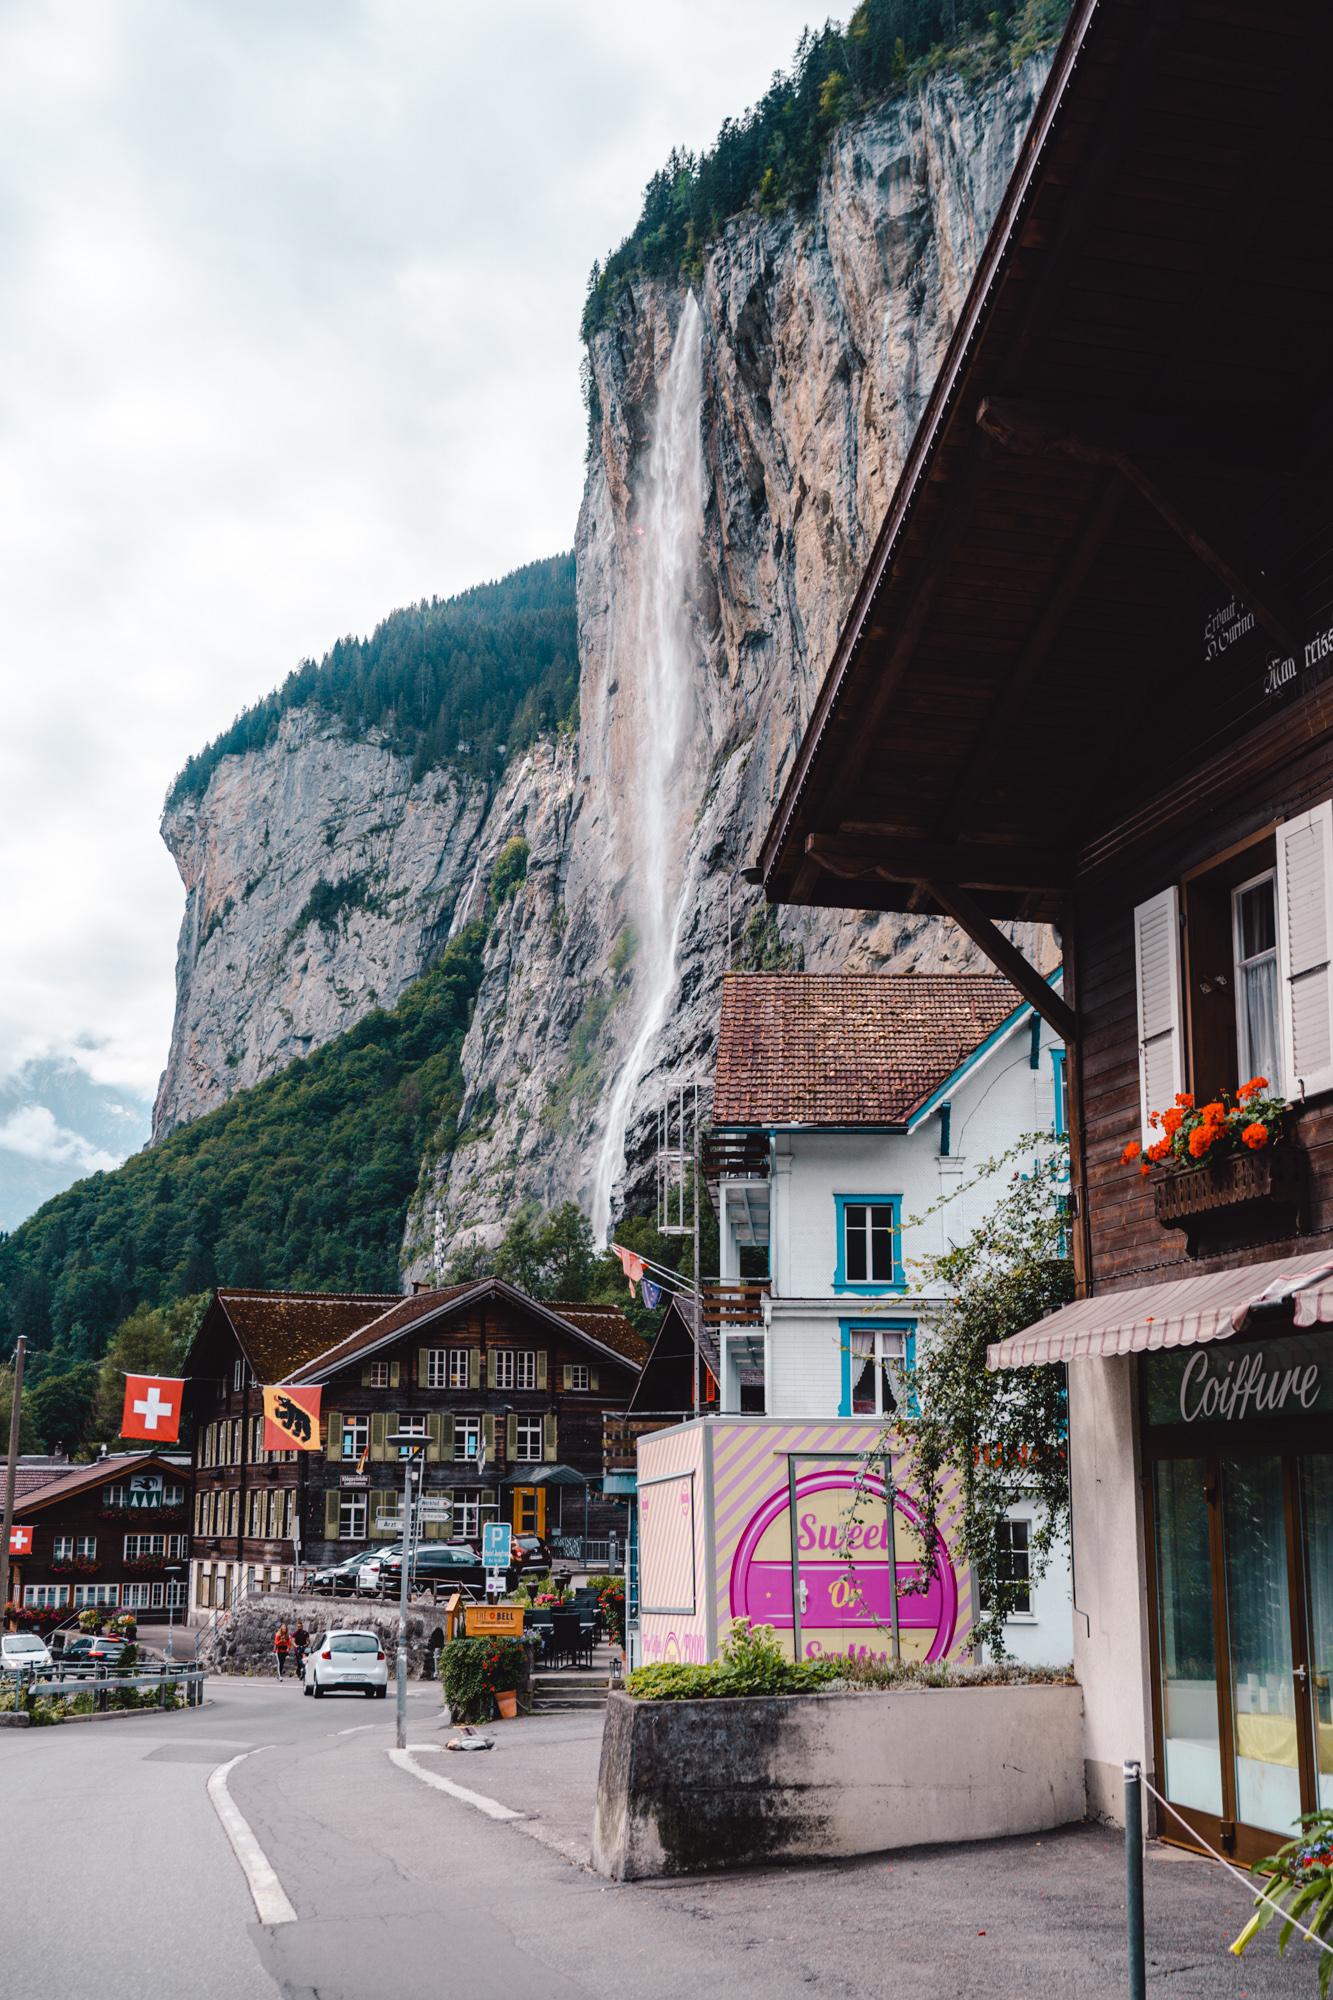 Beautiful view of Lauterbrunnen's main street in Switzerland.